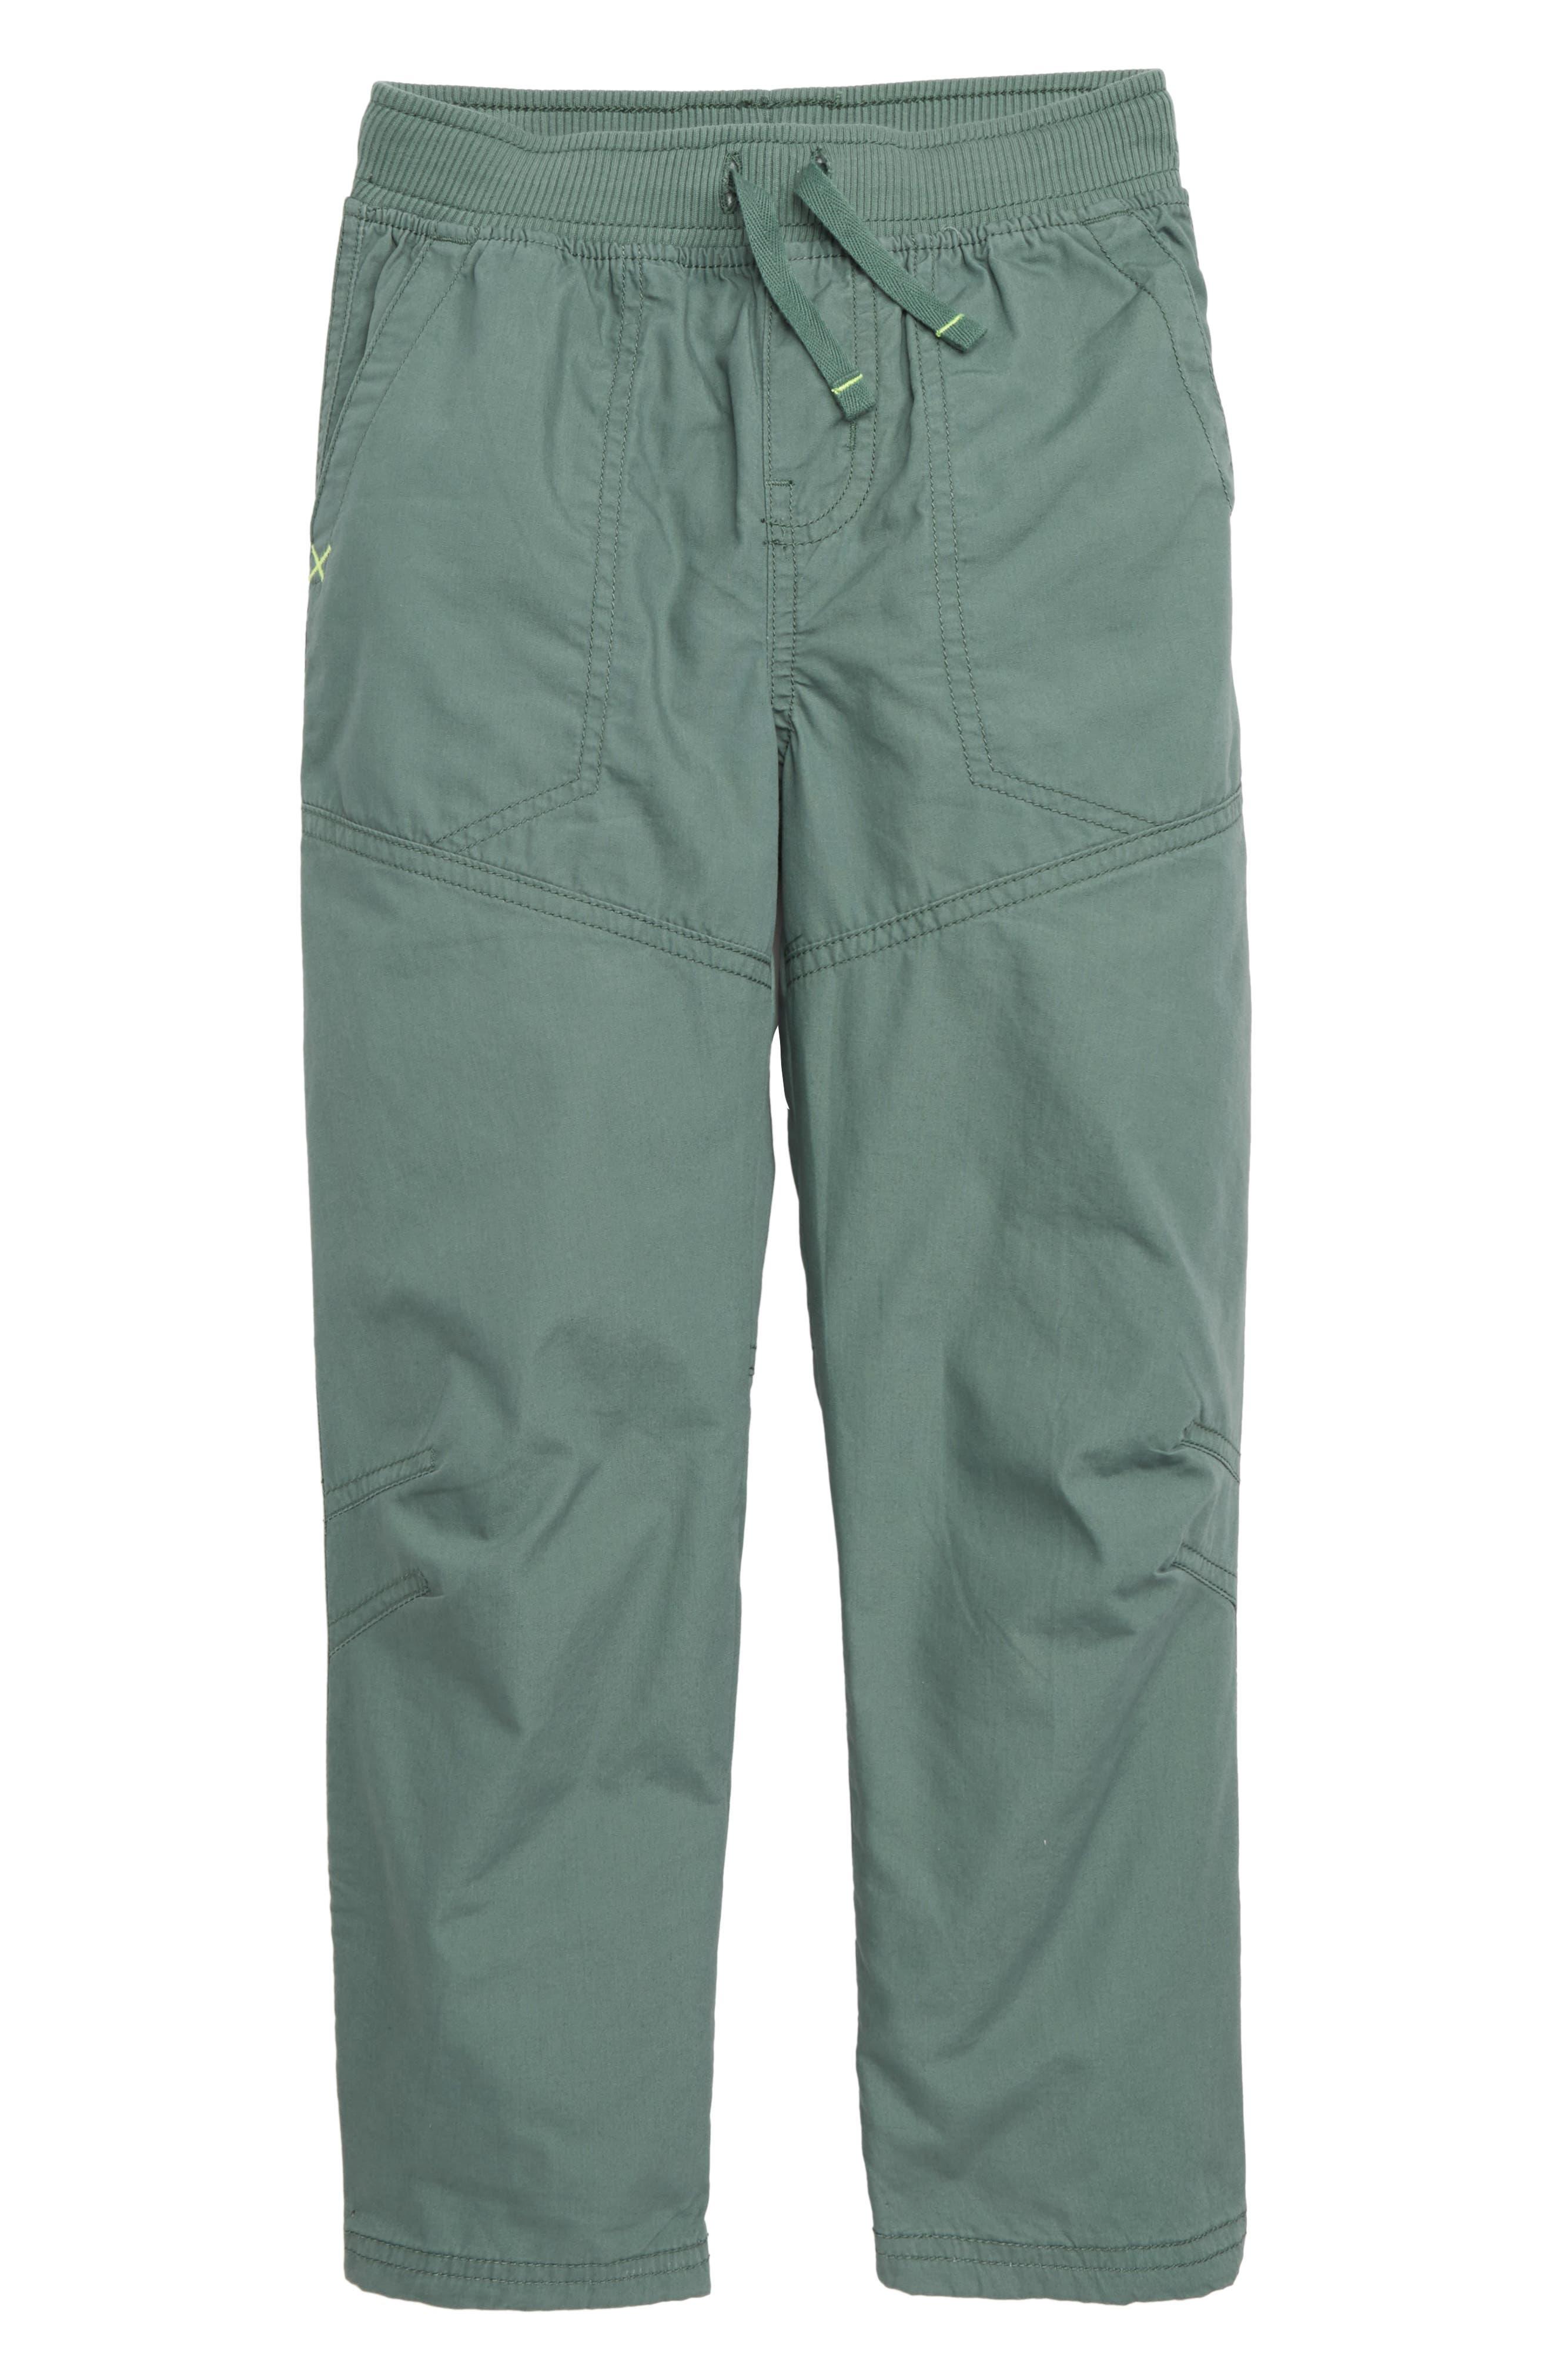 Lined Pants,                         Main,                         color, FOLIAGE